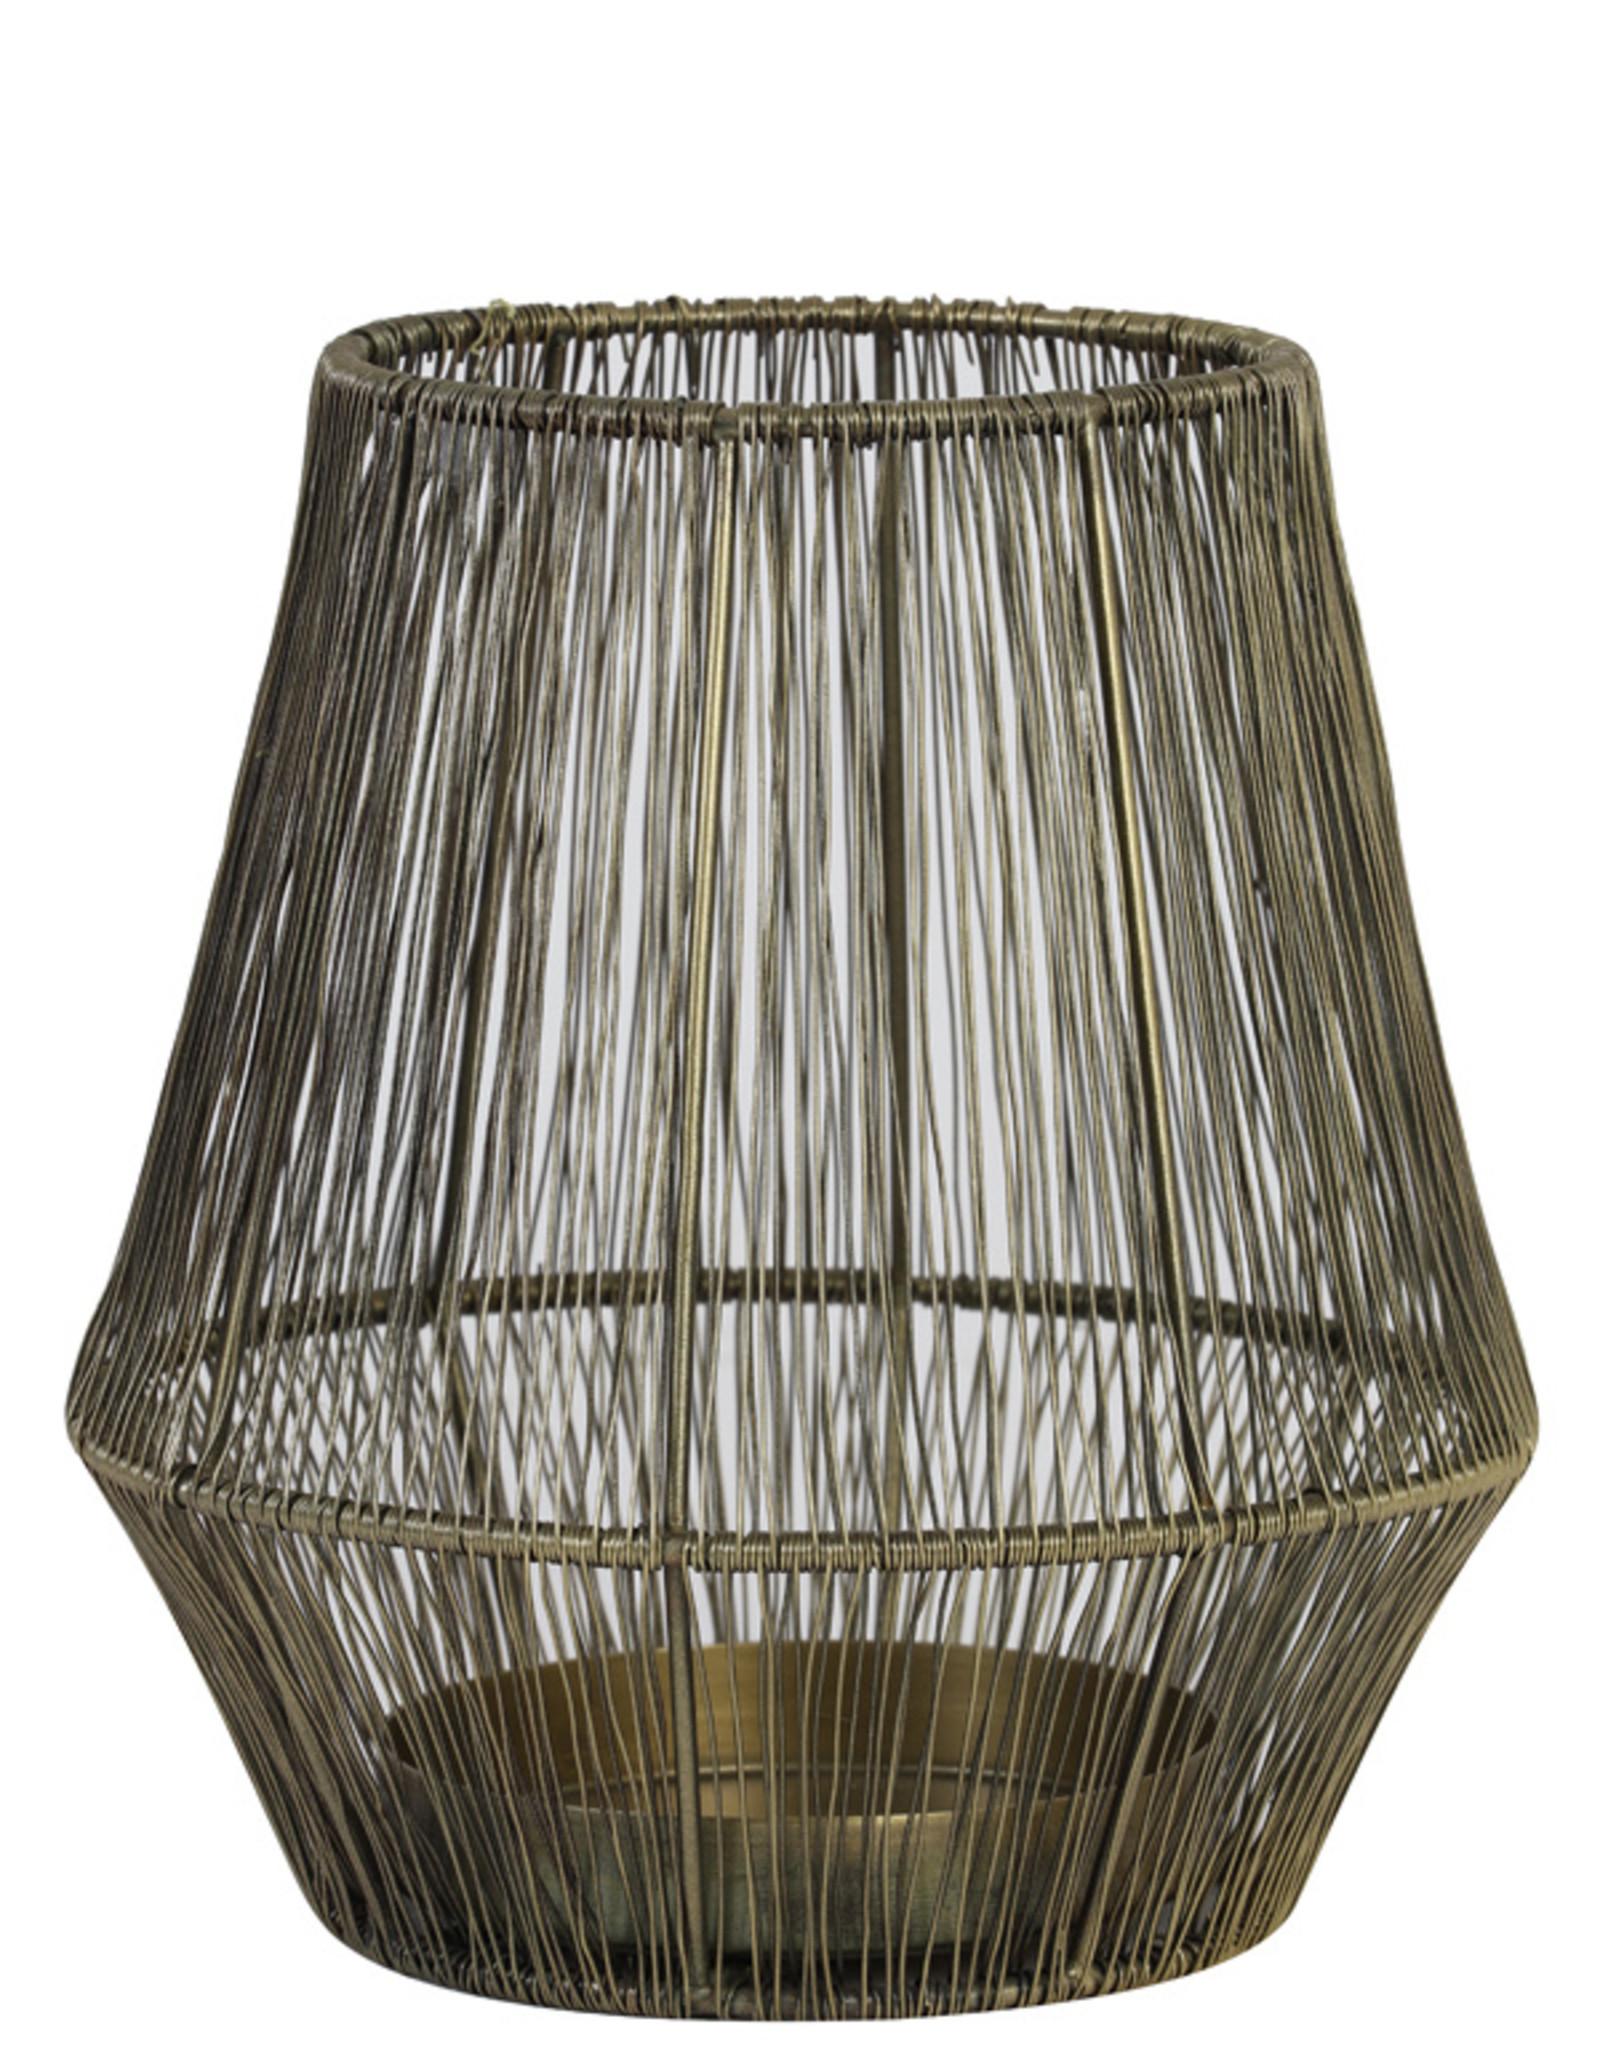 Light & Living Theelicht Ø20x22 cm VITU antiek brons